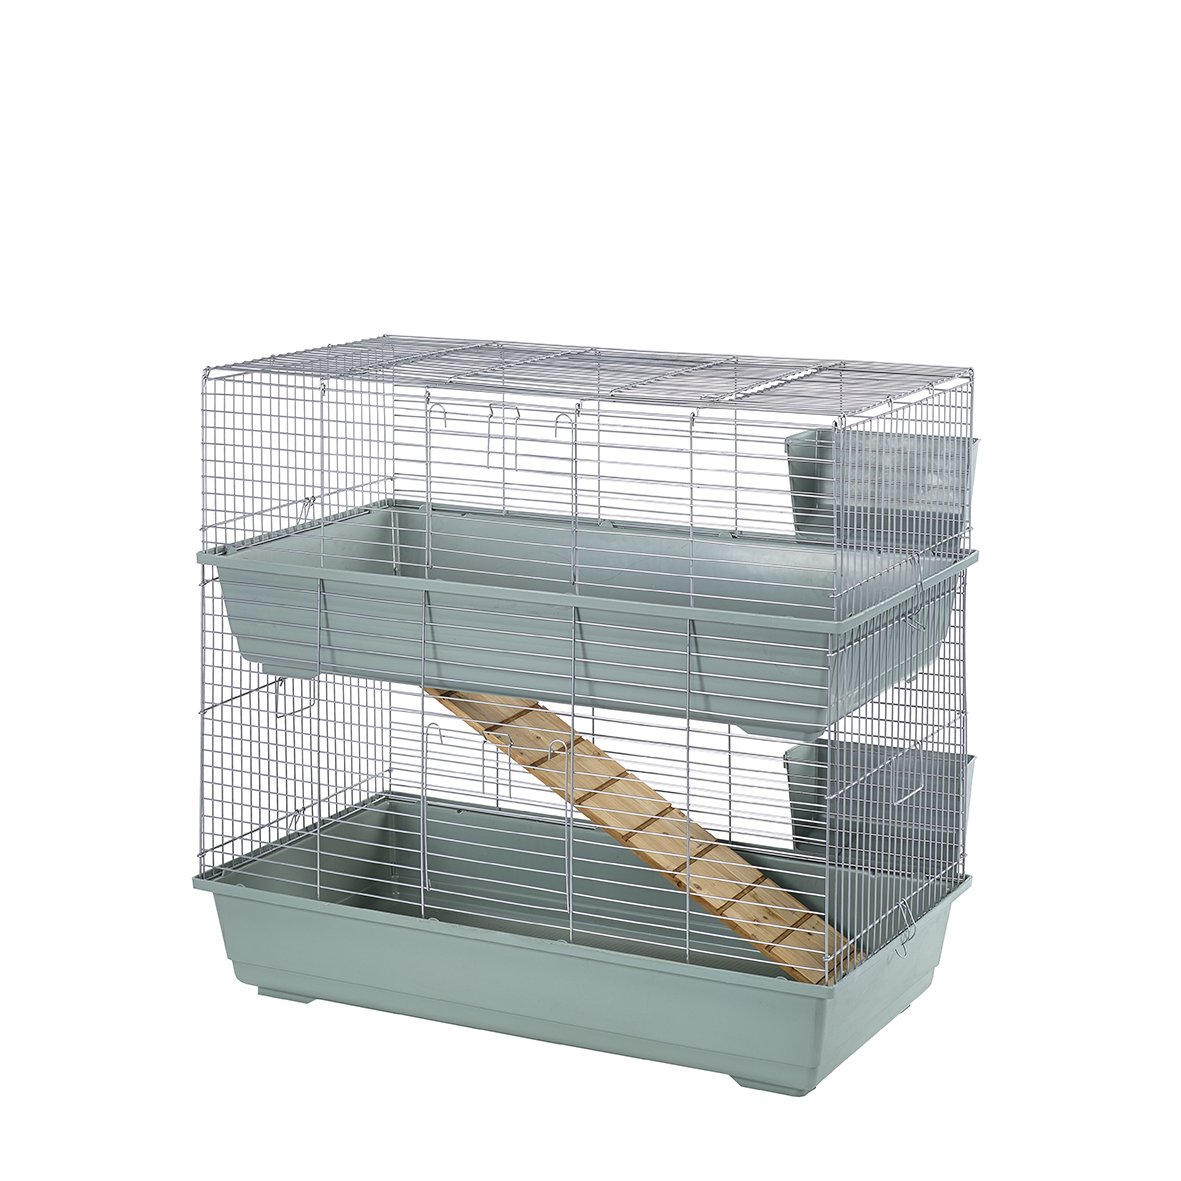 Beige Silver 80 cm Beige Silver 80 cm Little Friends Double Tier Rabbit Cage, 80cm, Beige Silver